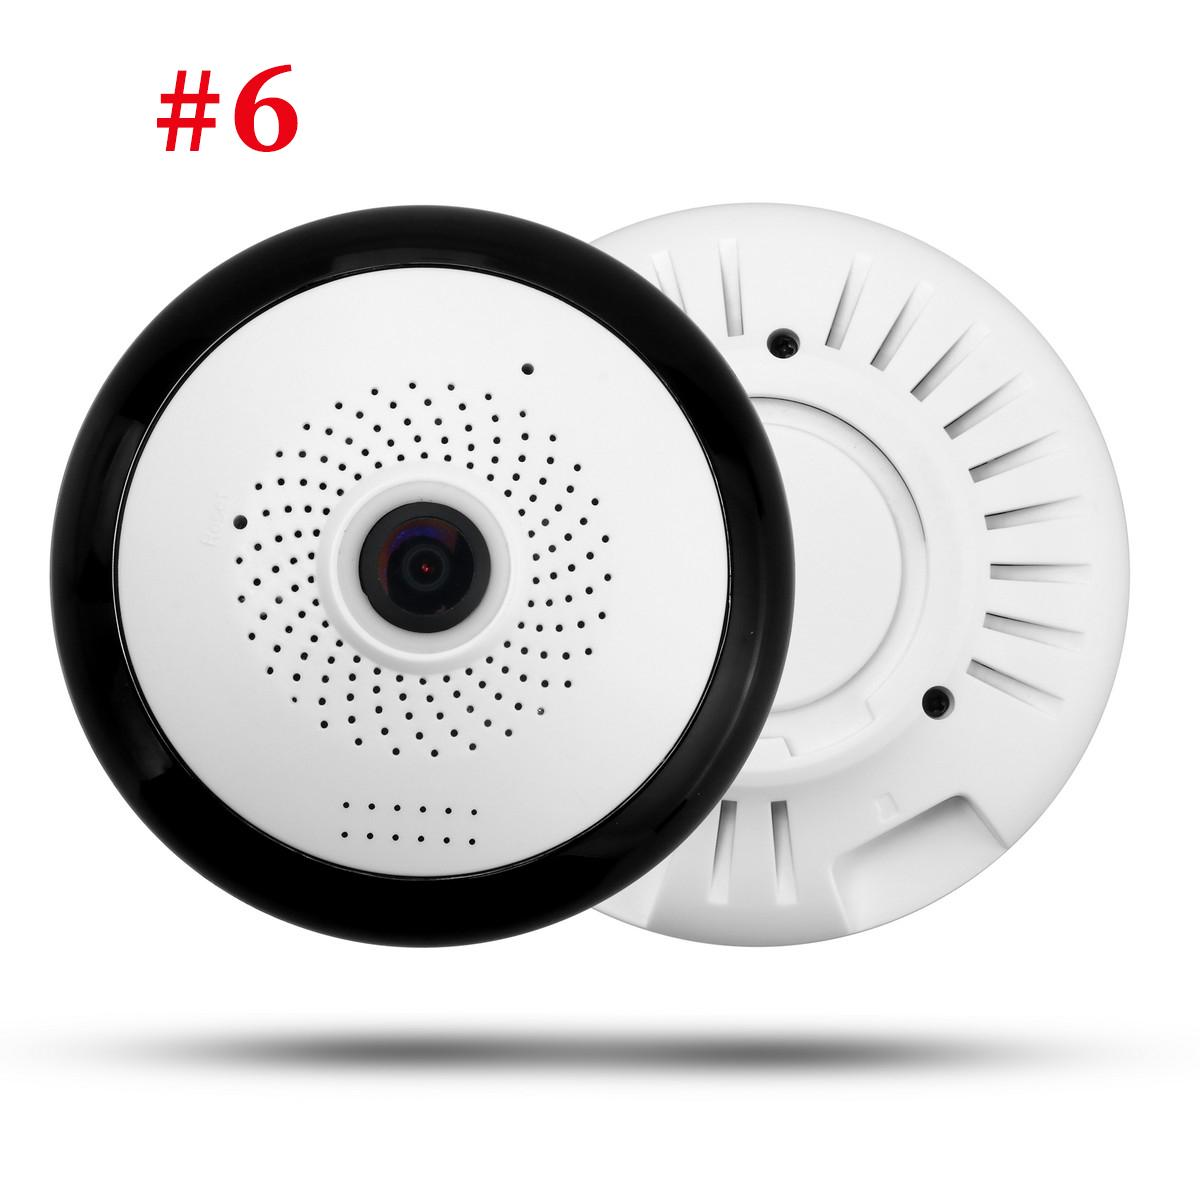 UGI Wireless HD FishEye IP WiFi Panoramic Camera 960P 360 Degree 1.3MP Security